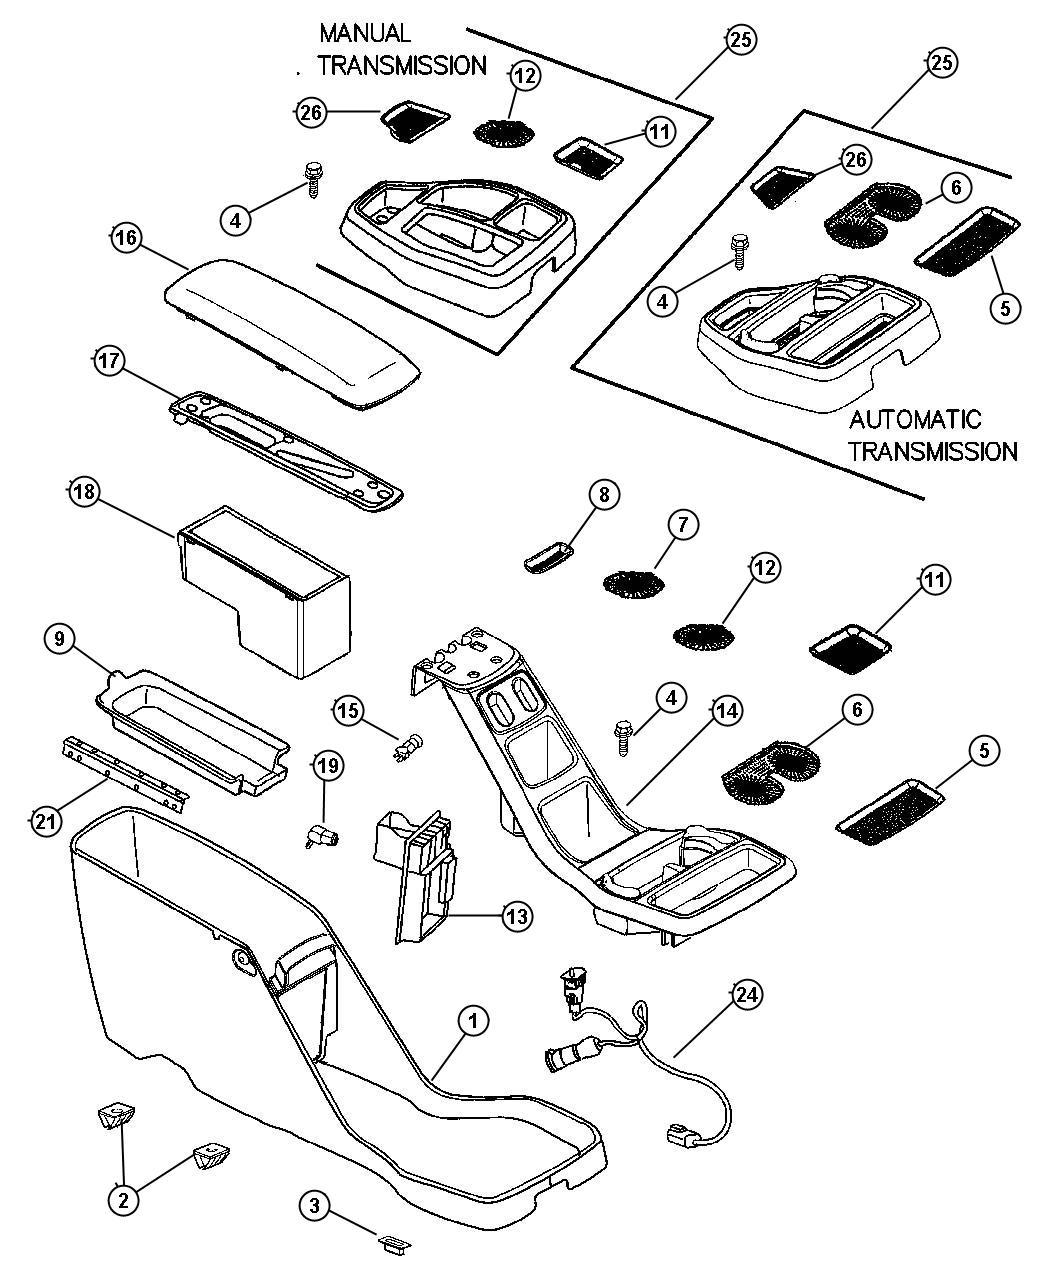 Dodge Dakota Console. Base. [l5] up to 01/14/02. Trim